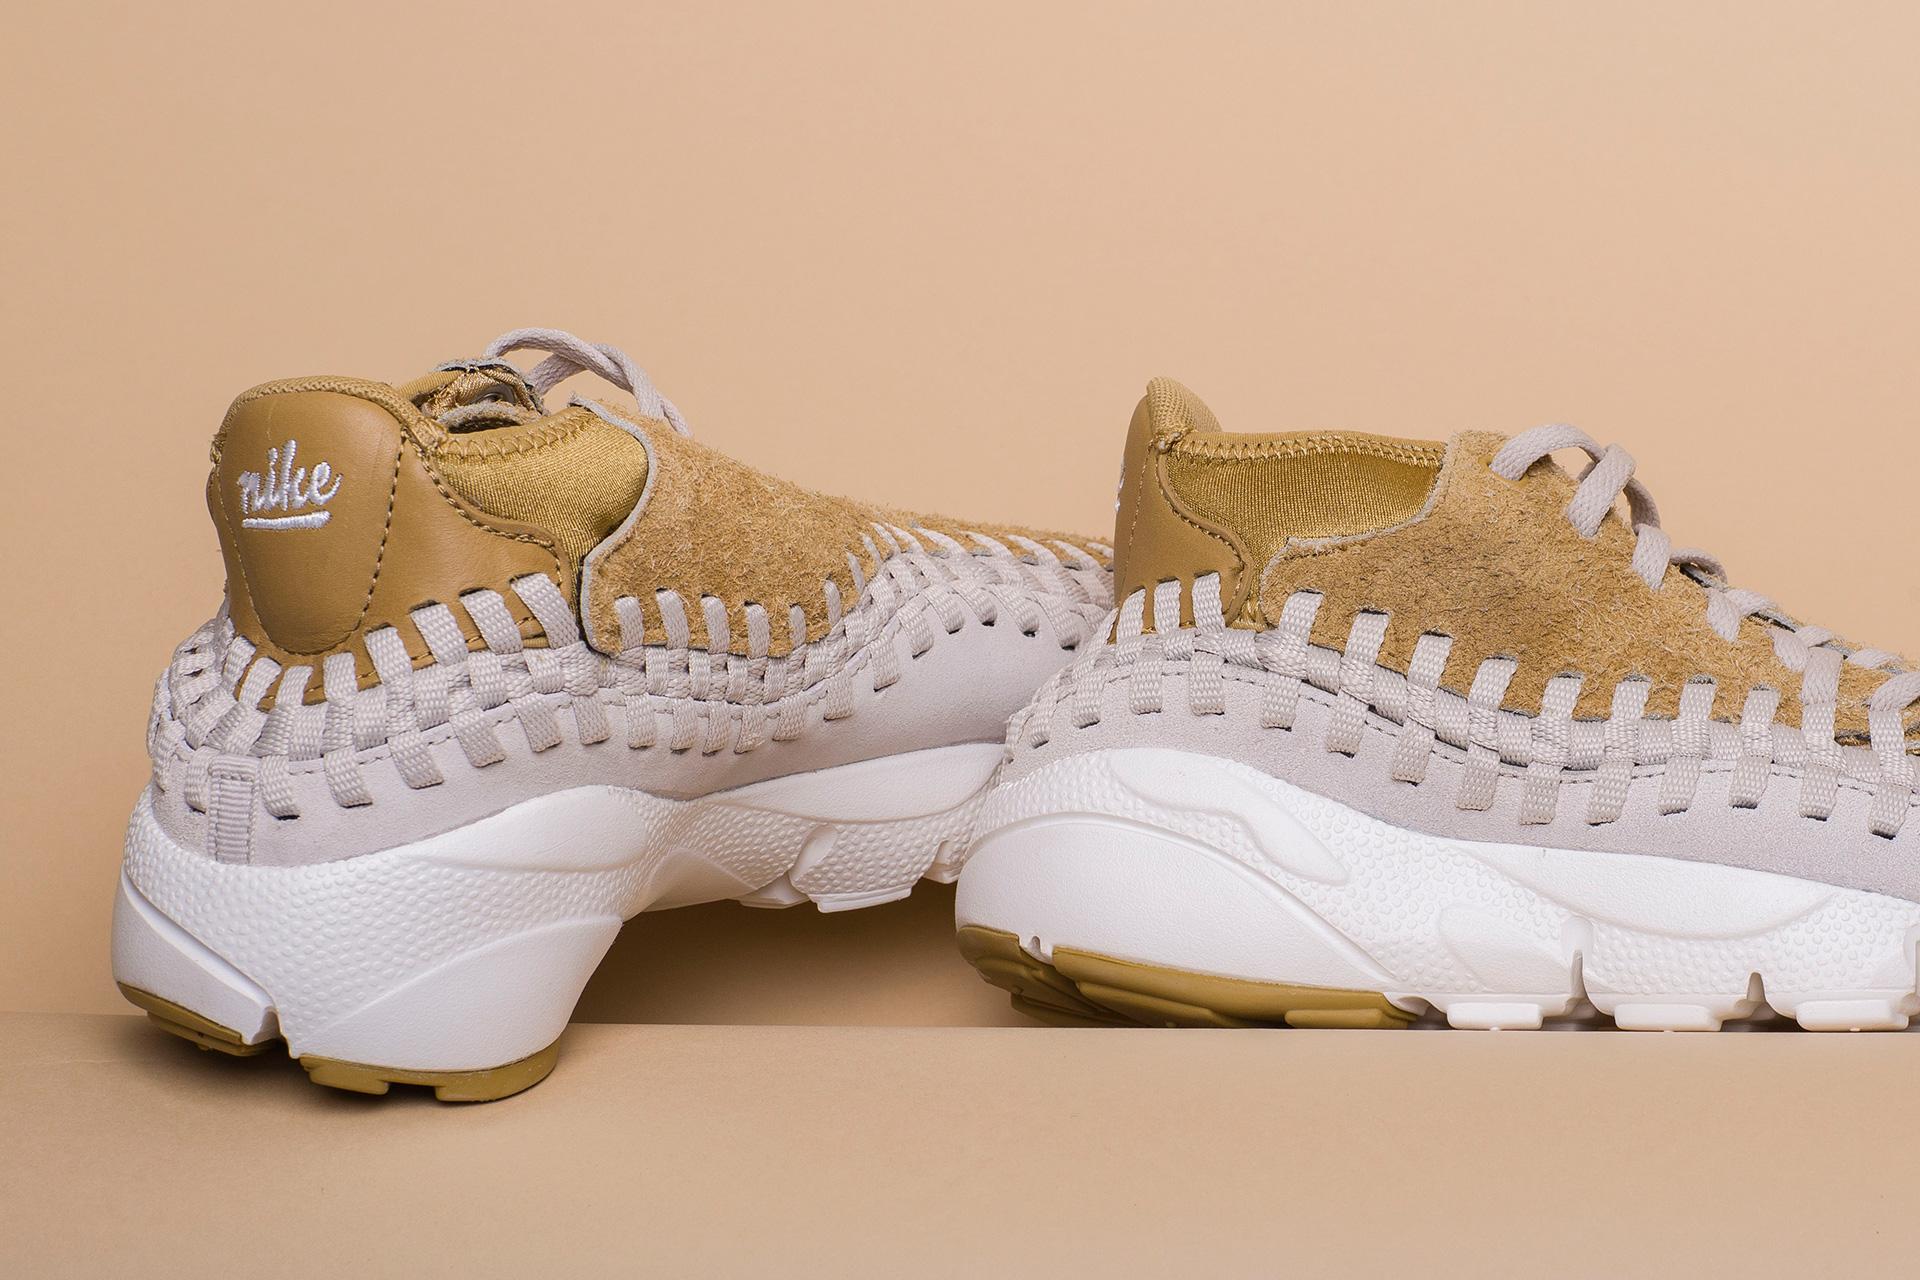 separation shoes 03ec0 1fb45 ... Купить мужские бежевые кроссовки Nike Footscape Woven Chukka QS - фото  5 картинки